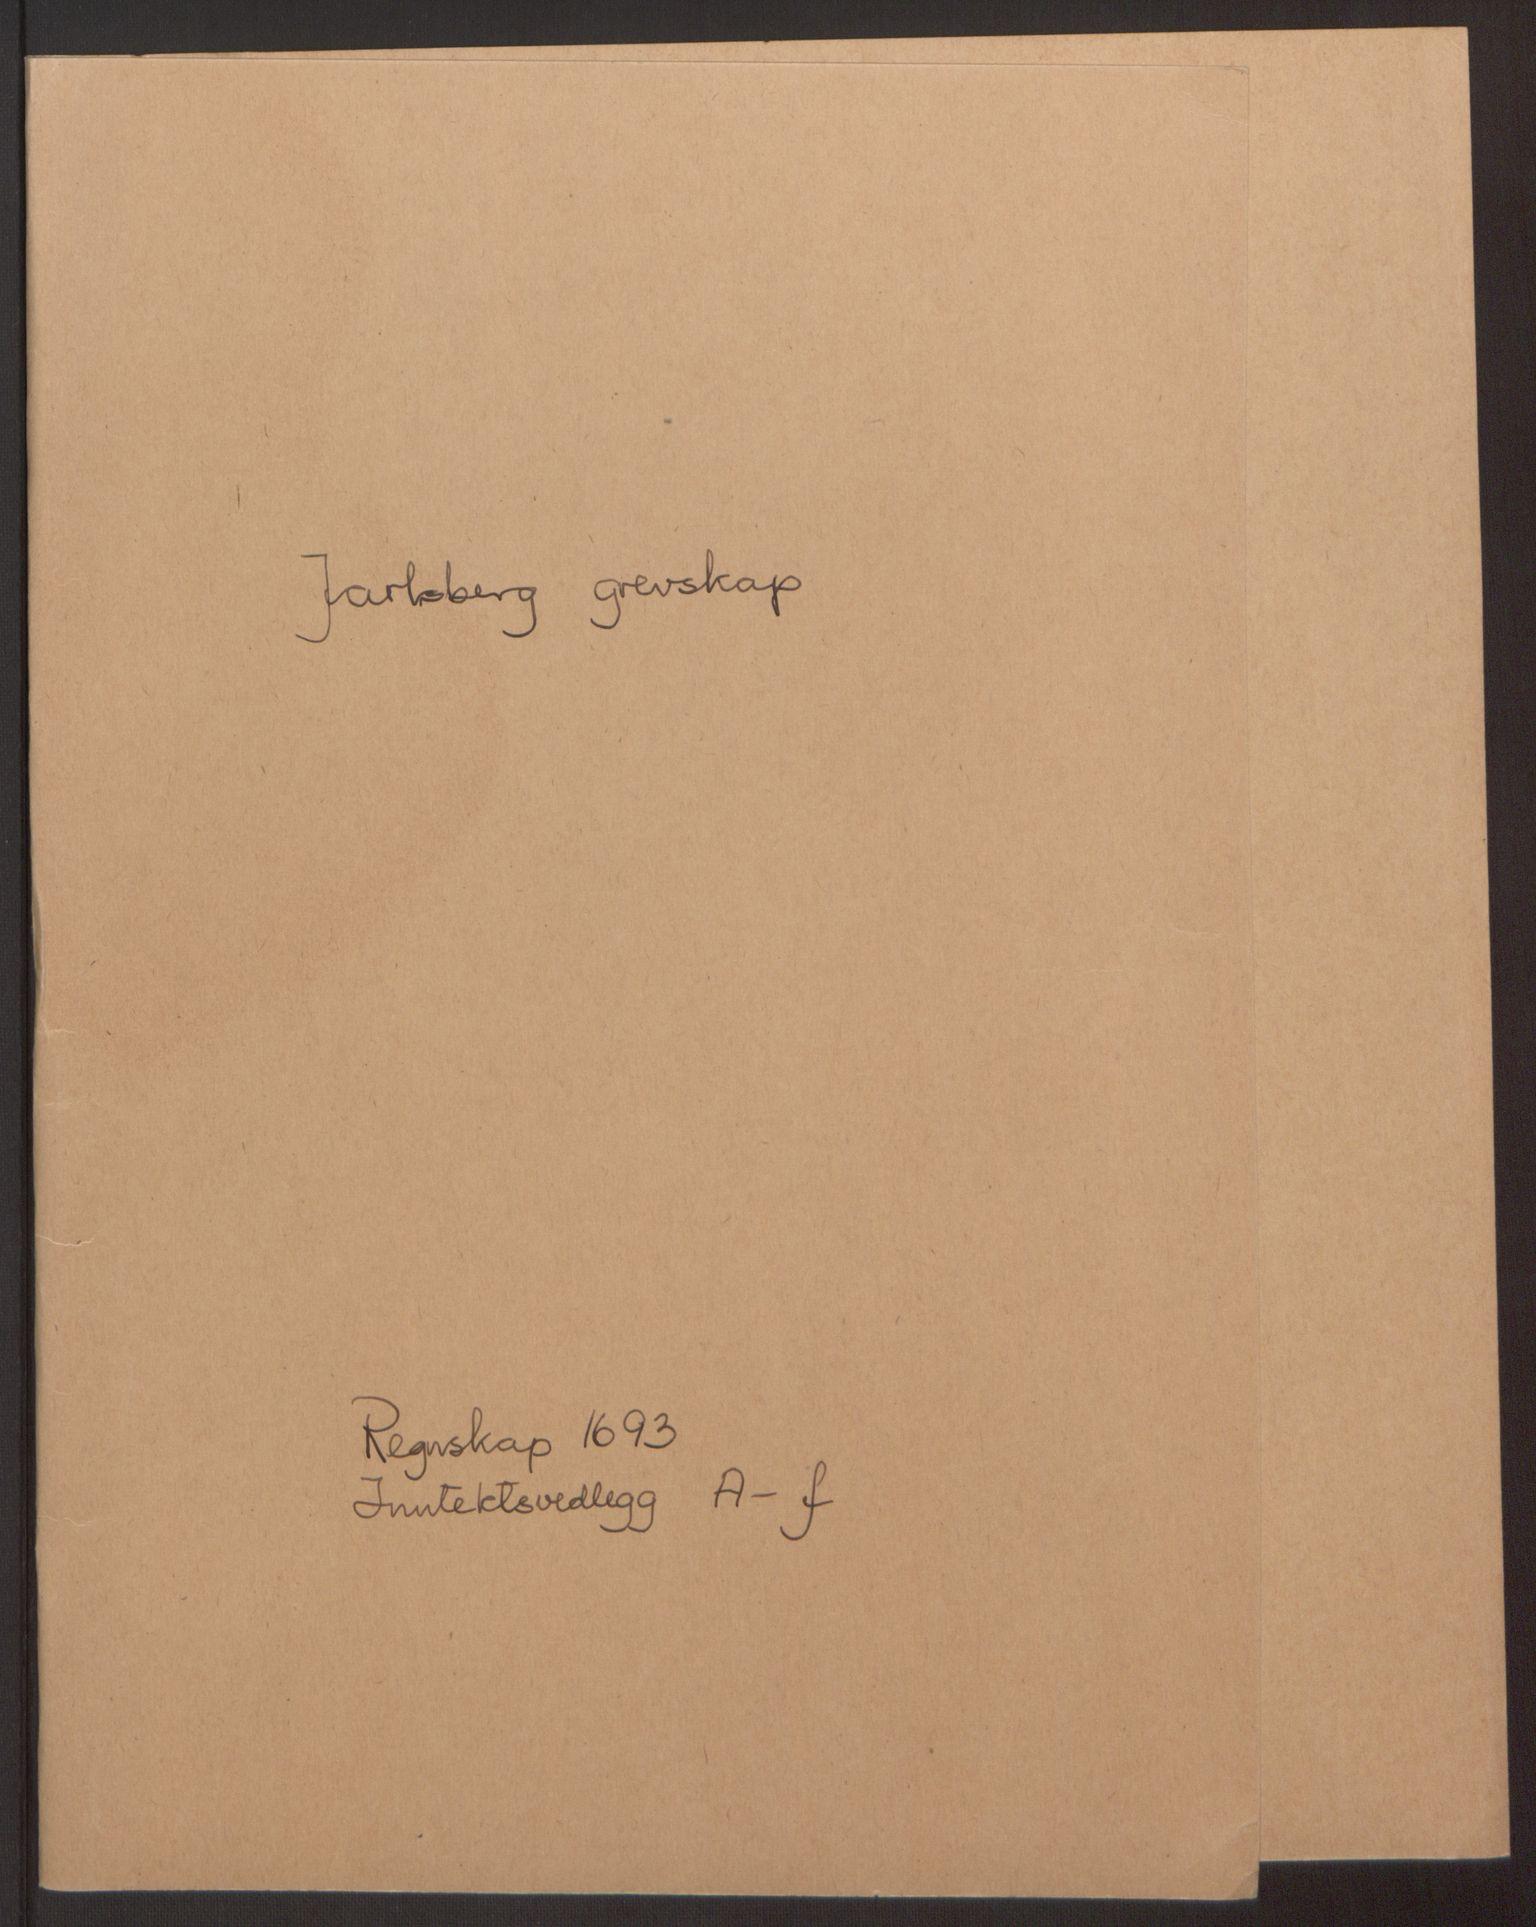 RA, Rentekammeret inntil 1814, Reviderte regnskaper, Fogderegnskap, R32/L1866: Fogderegnskap Jarlsberg grevskap, 1693, s. 2